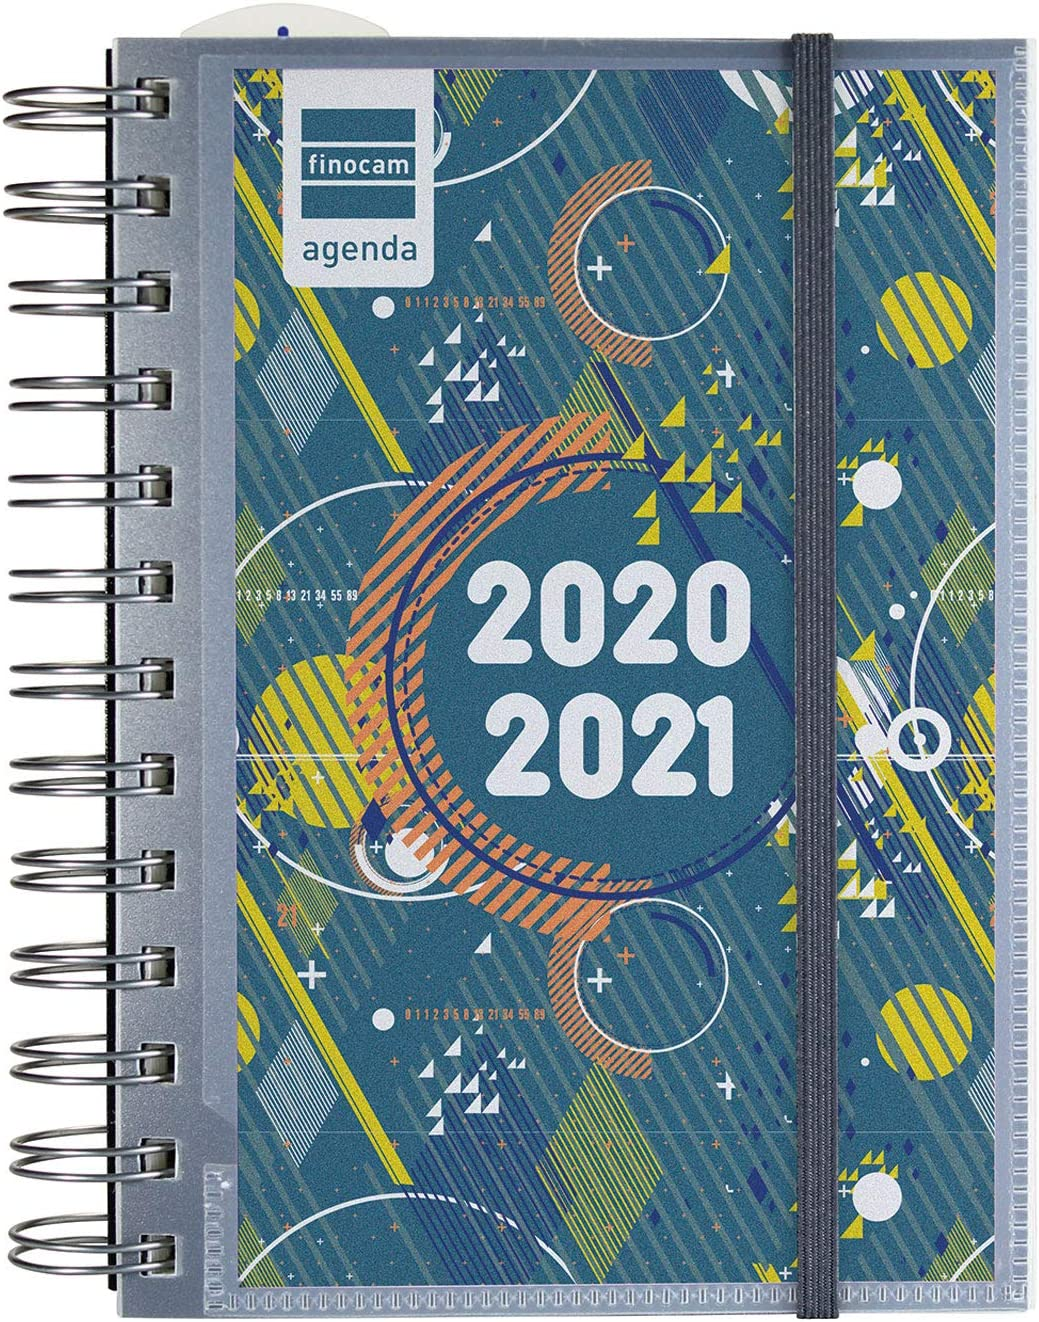 Finocam - Agenda Curso 2020-2021 para Secundaria Octavo, 120 x 169, 1 Día Página (sept-jun) Mini Institut Tapa Personalizable, Español